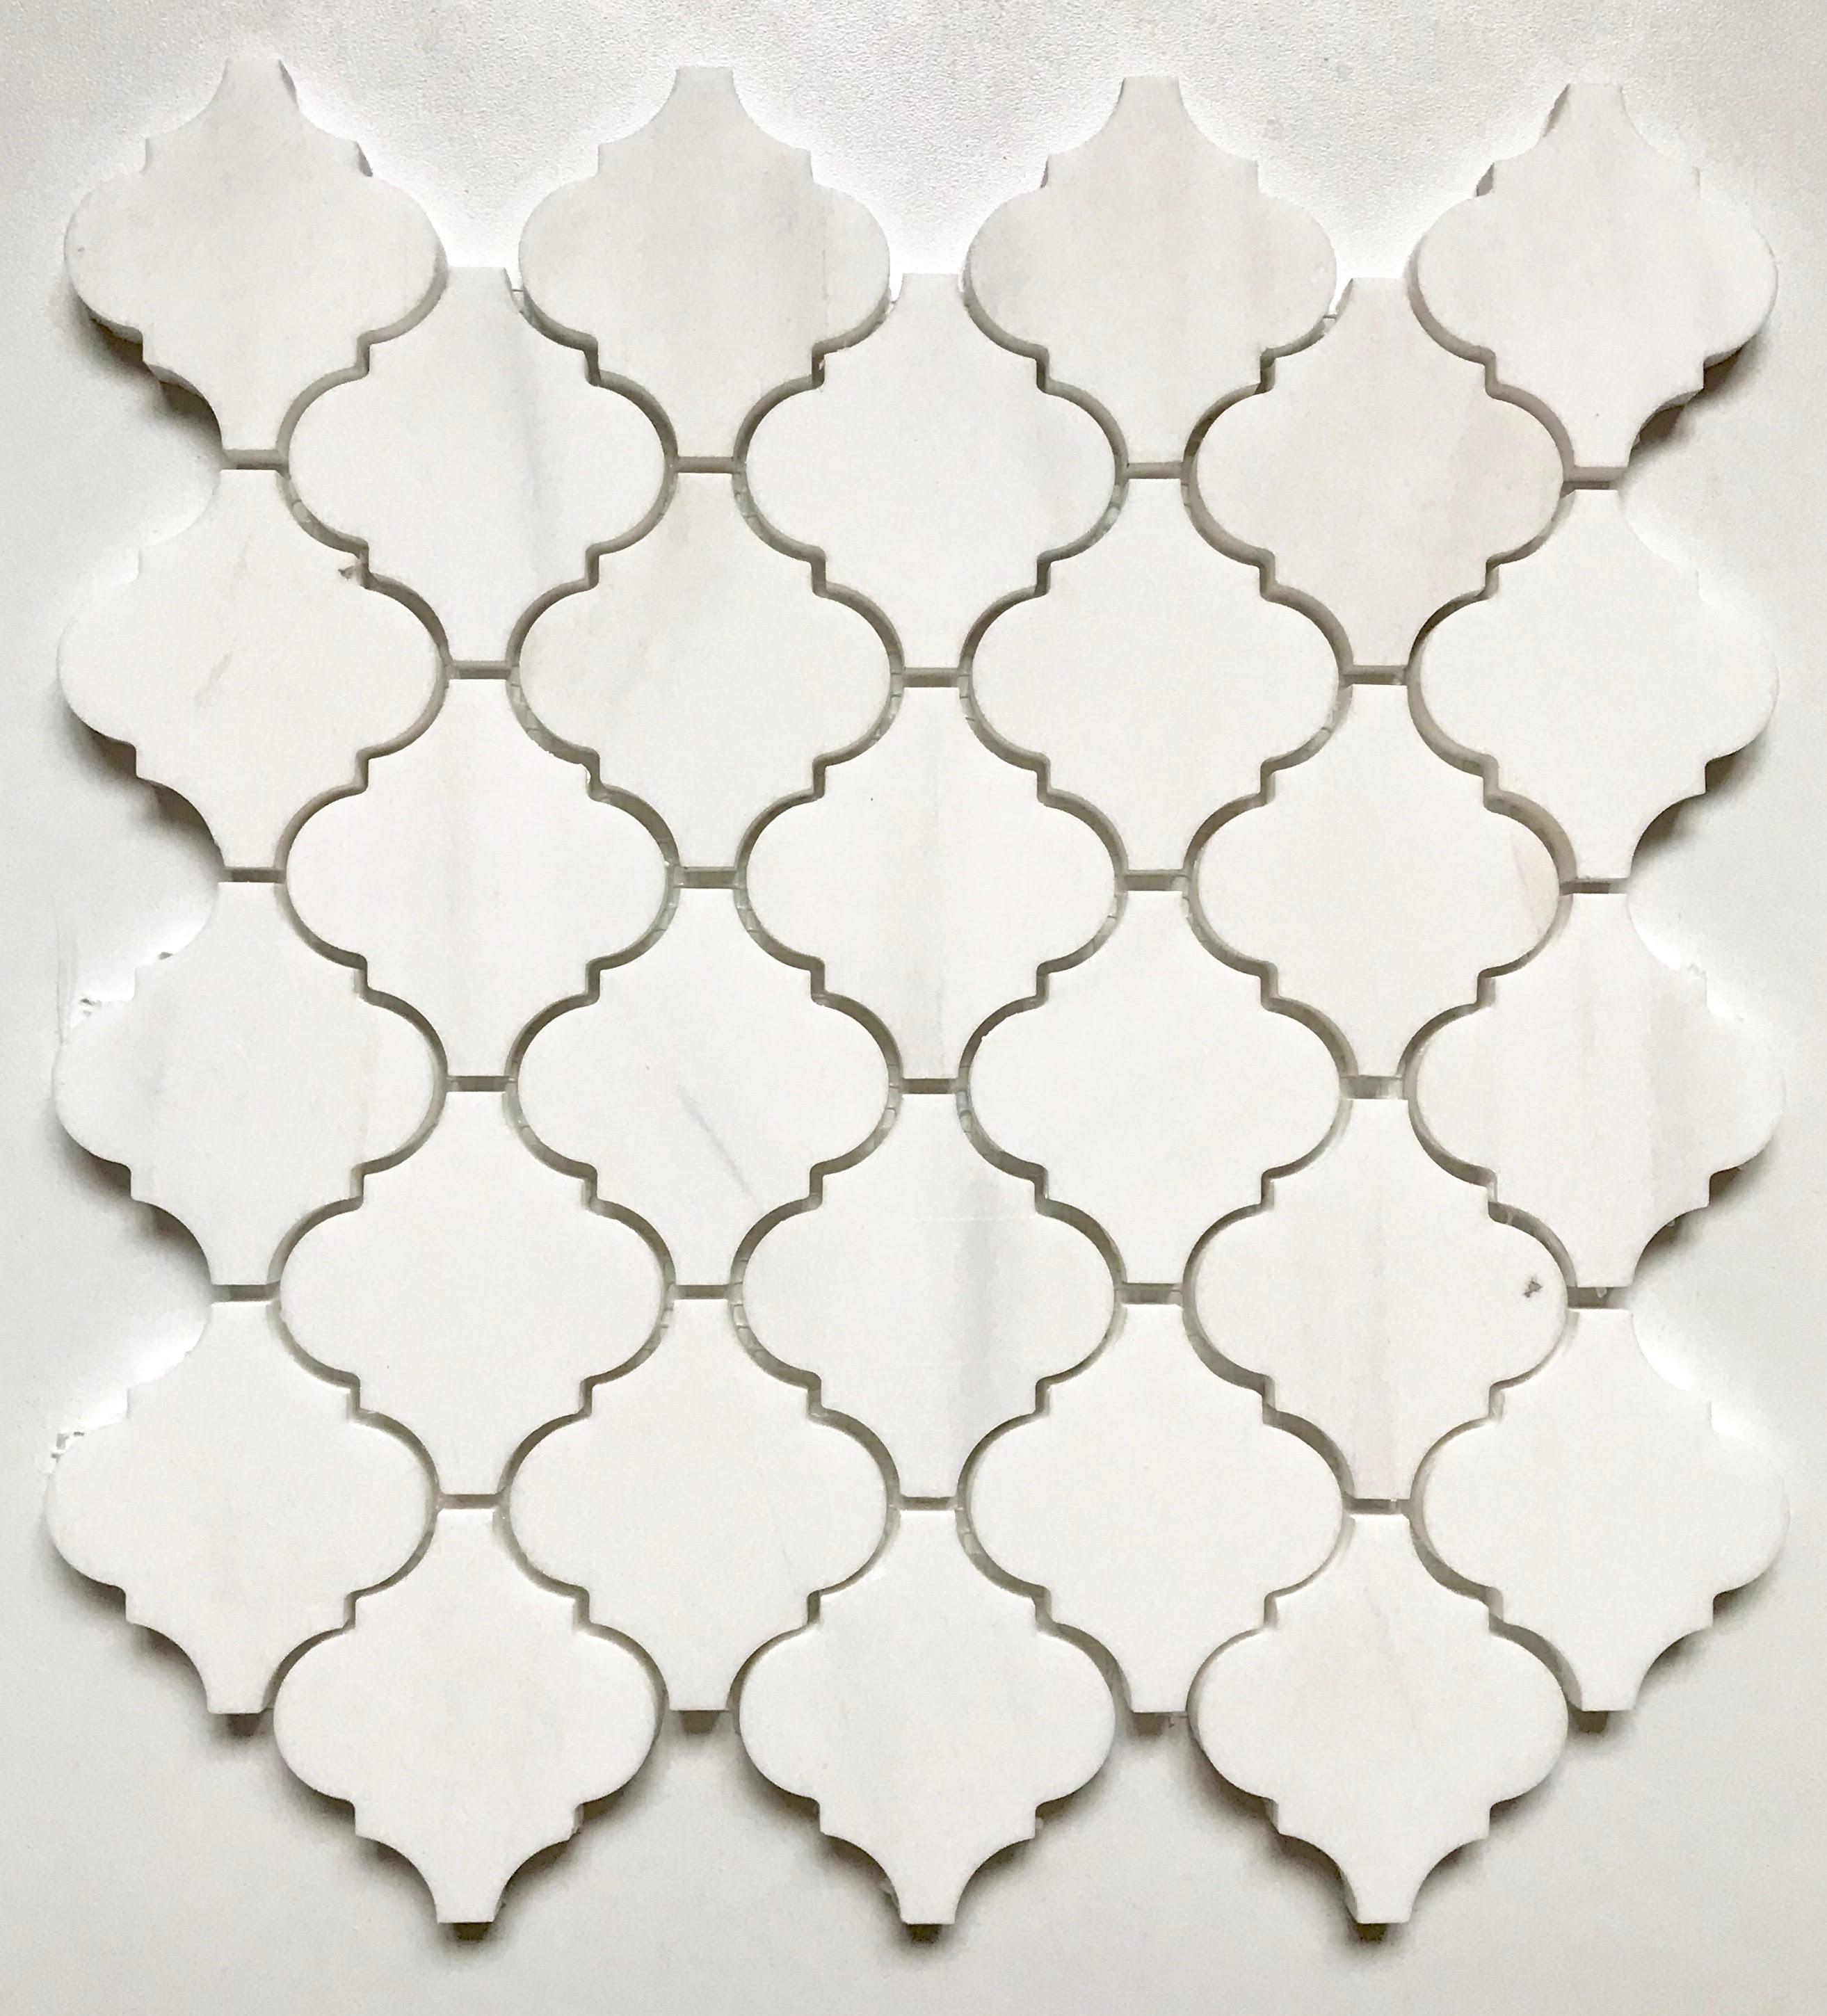 Tarmak-Usa-Stone-Collection-Arabesque-Bianco-Dolomite